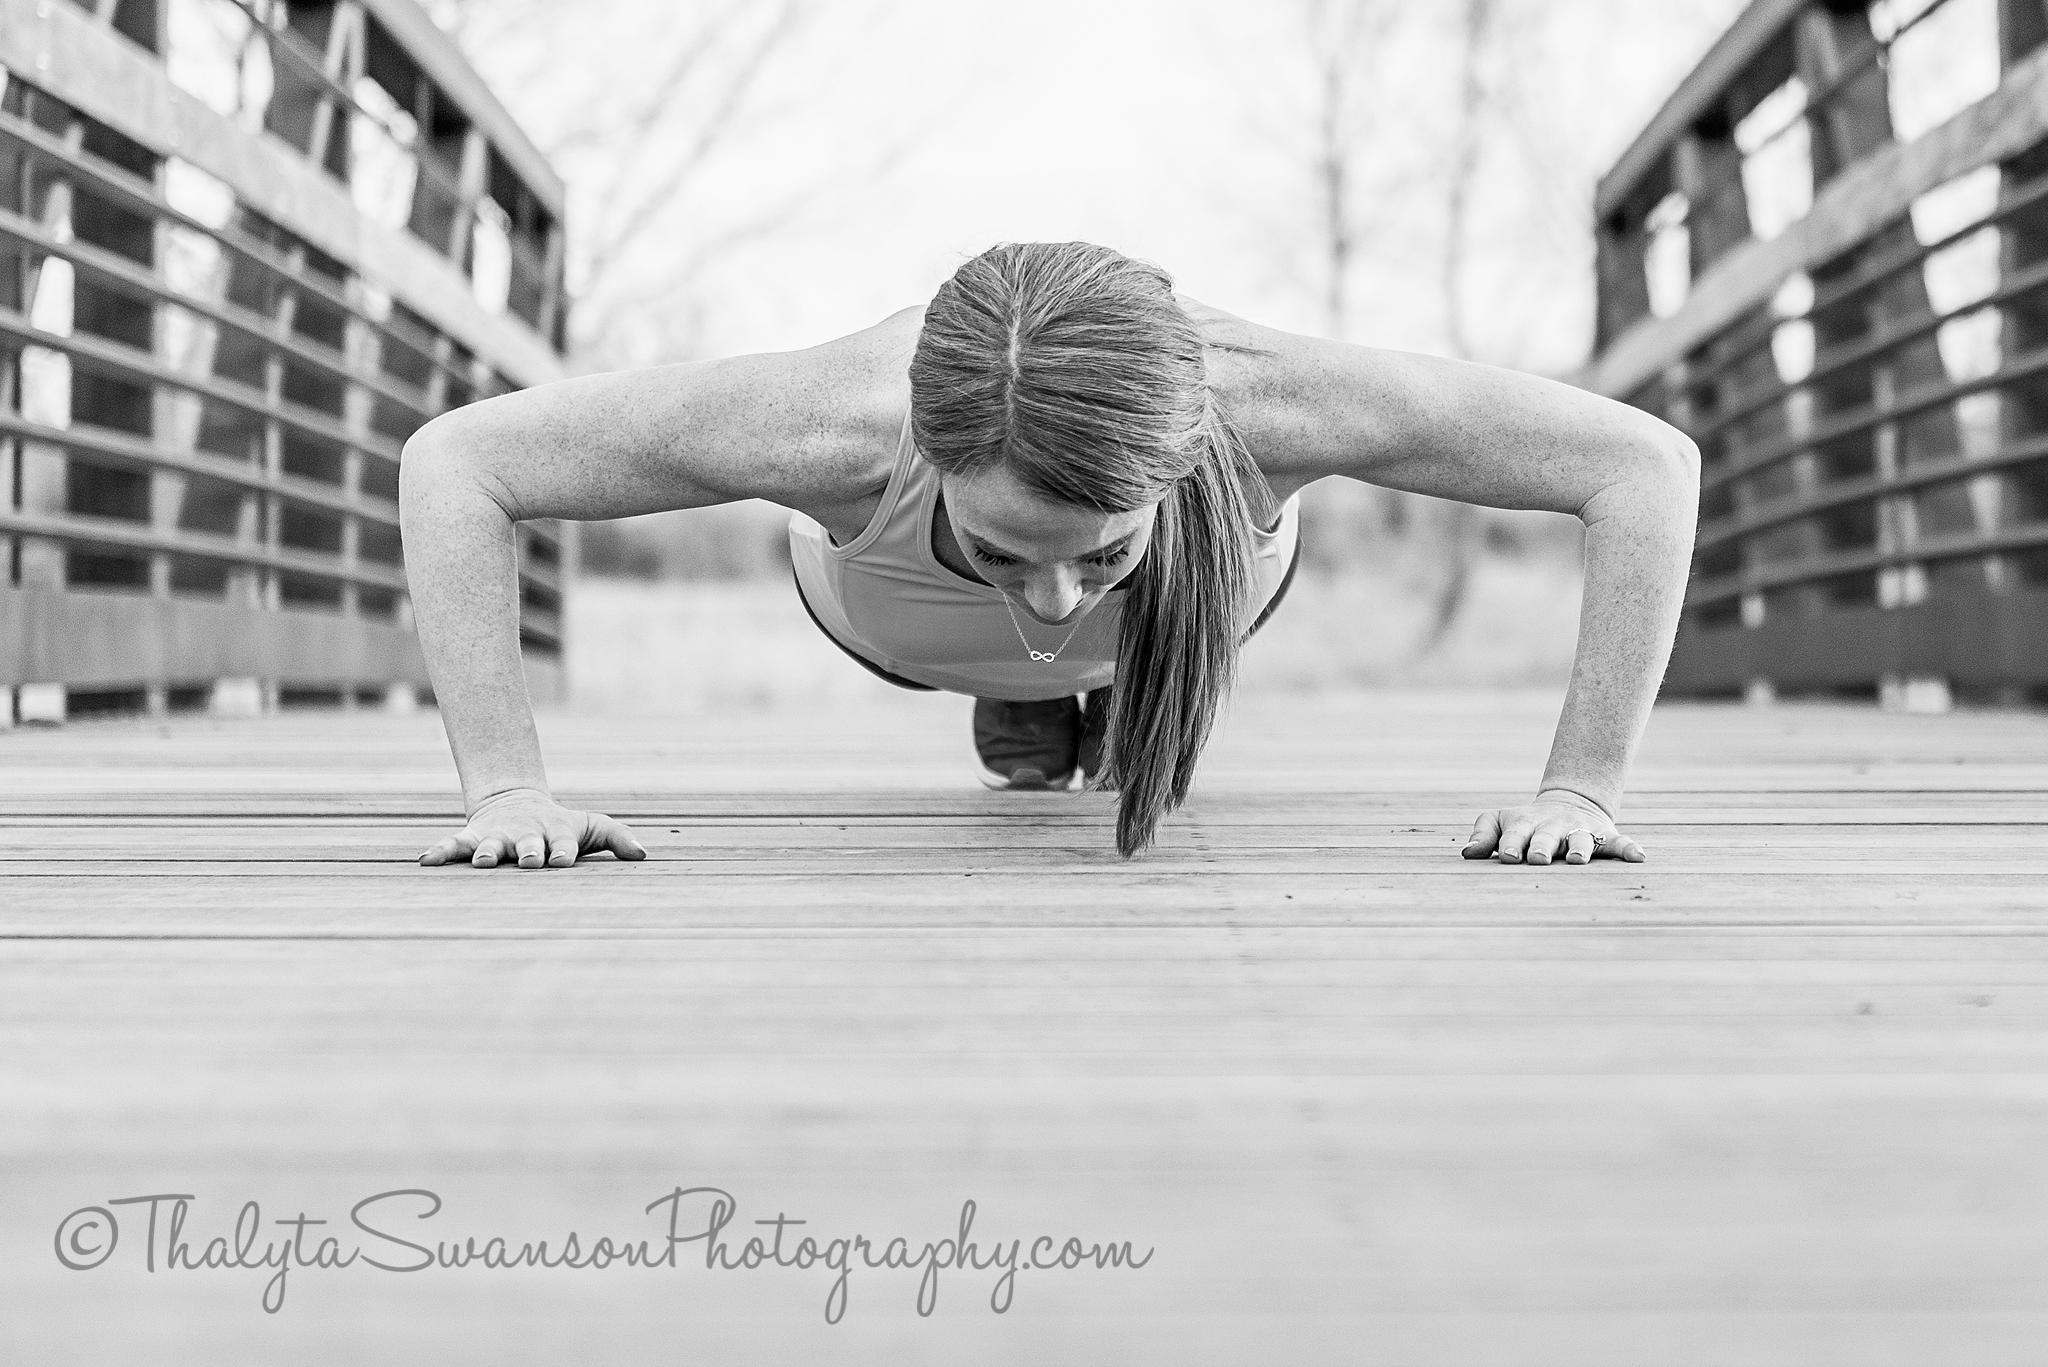 Thalyta Swanson Photography - Fitness Photos (8)